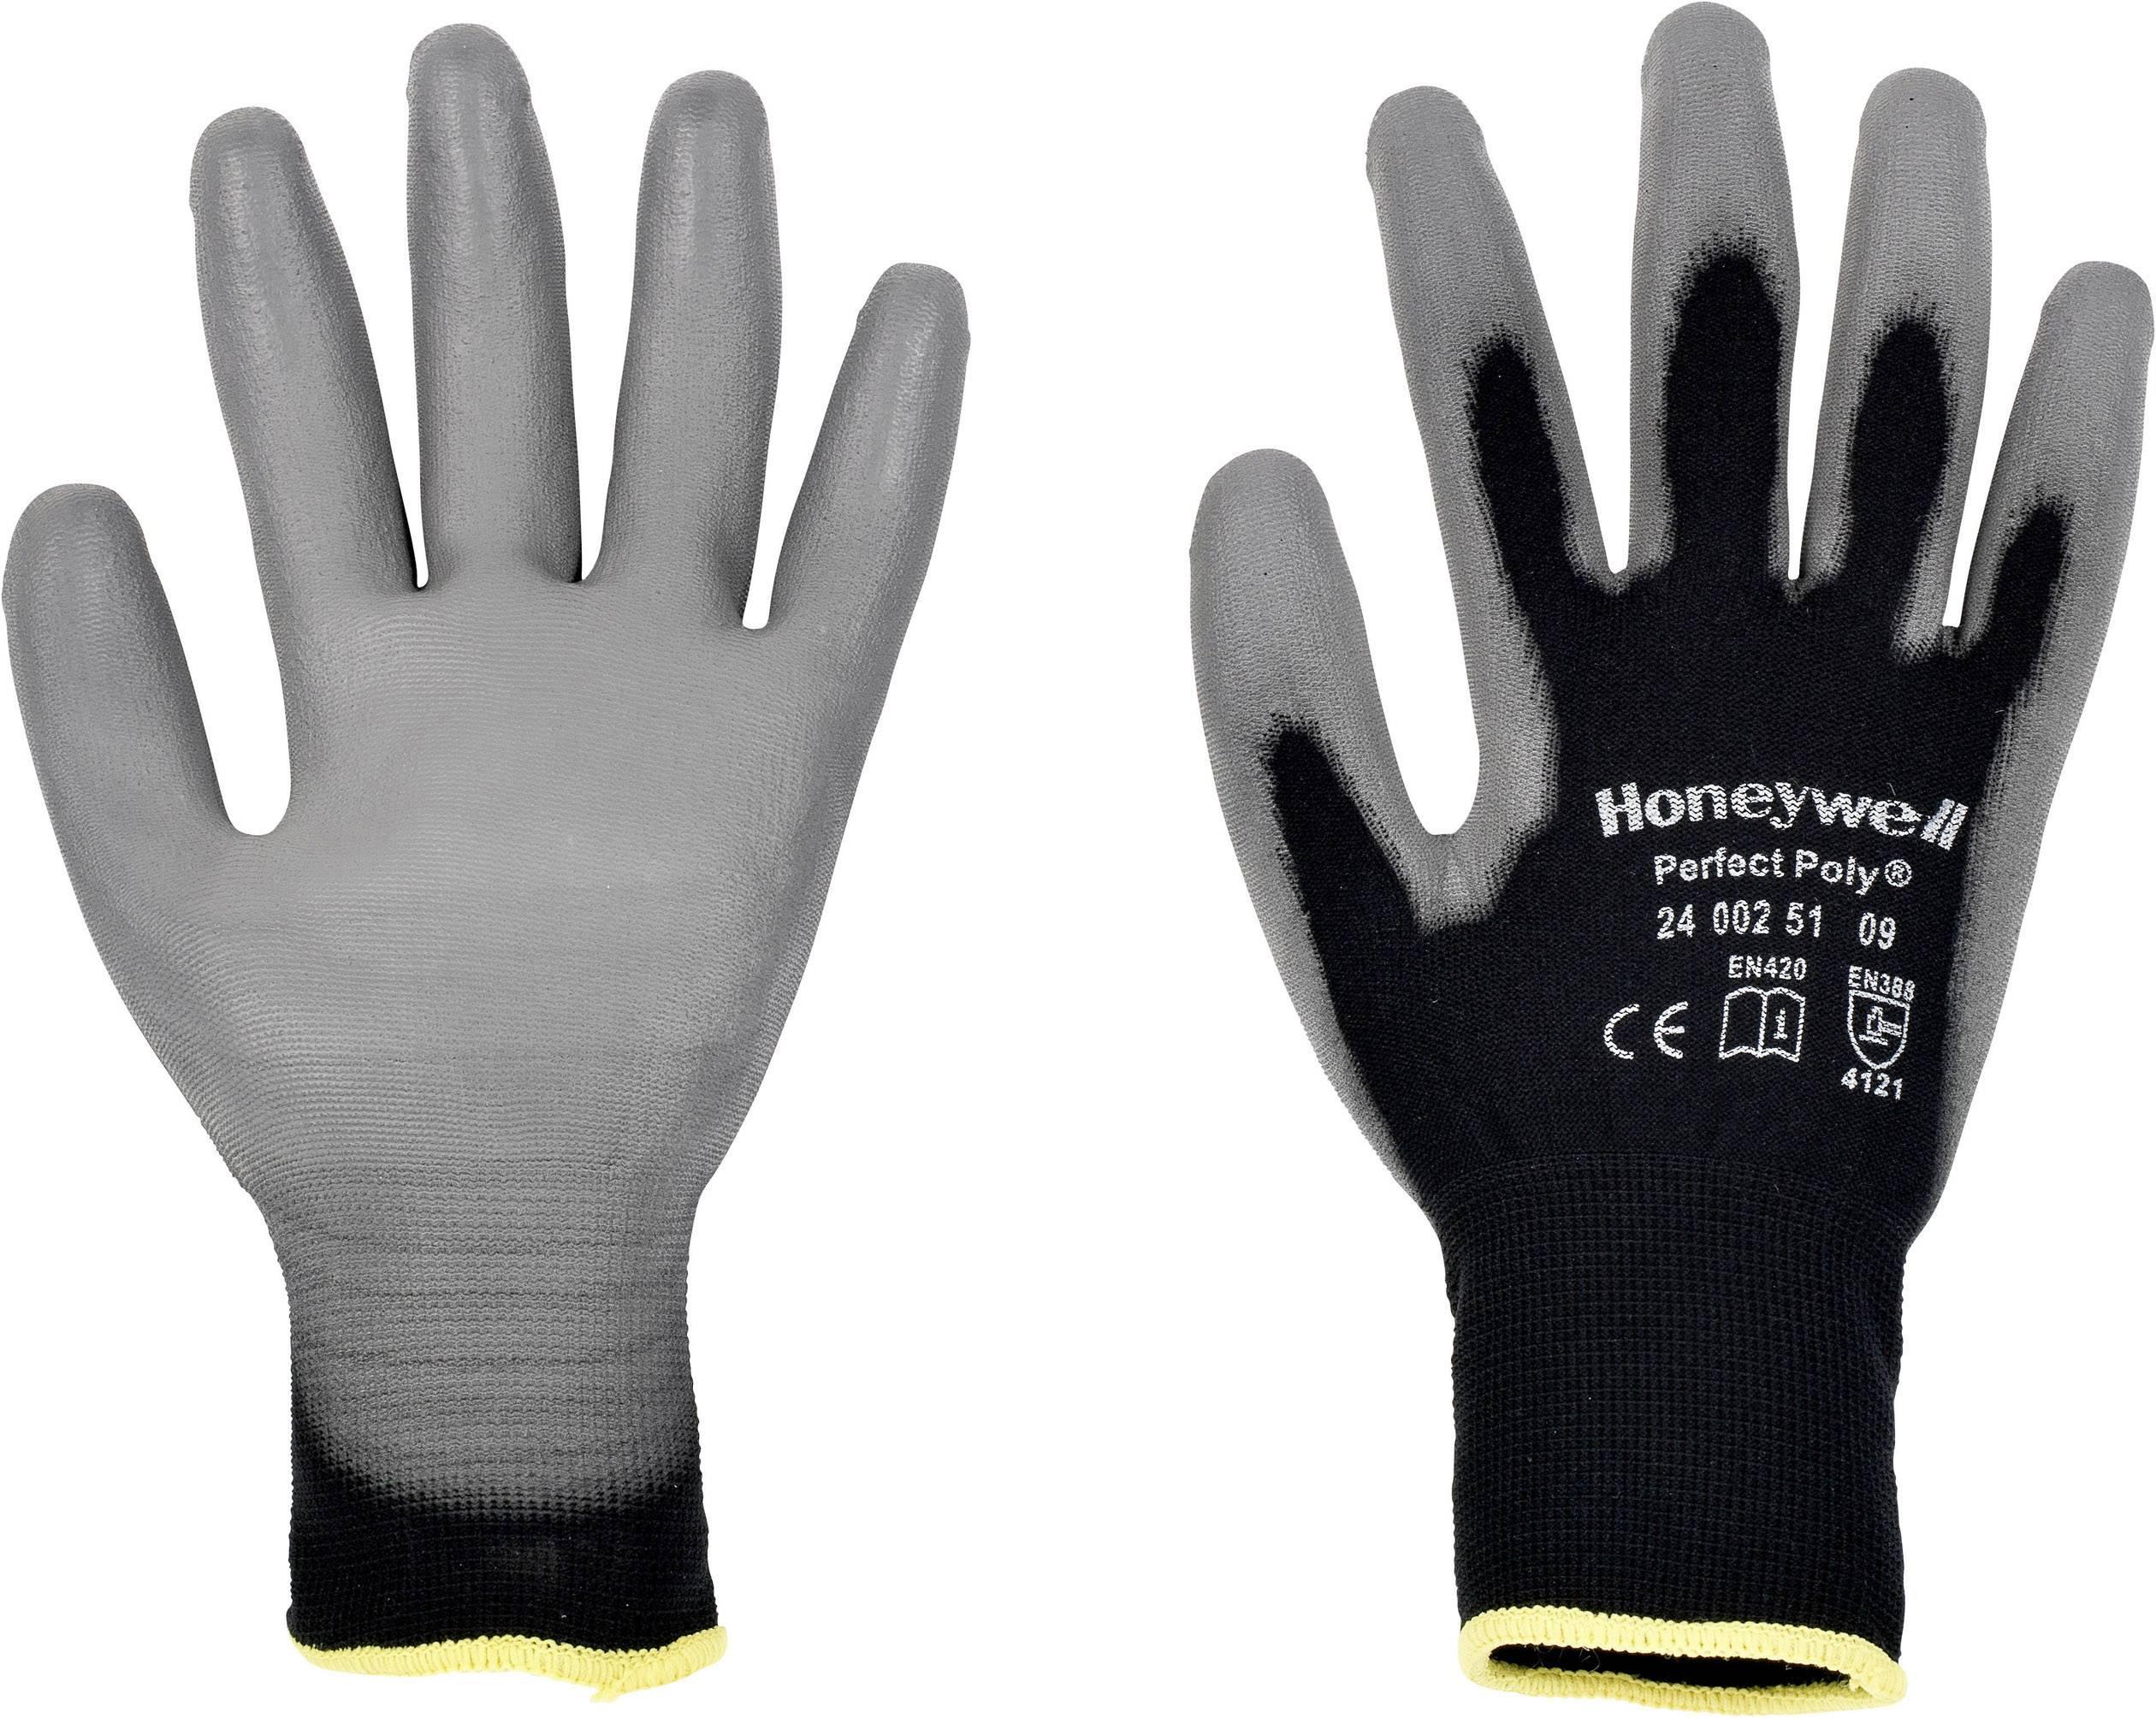 Pracovné rukavice Perfect Fit GANTS NOIRS PERFECTPOLY 2400251, velikost rukavic: 9, L